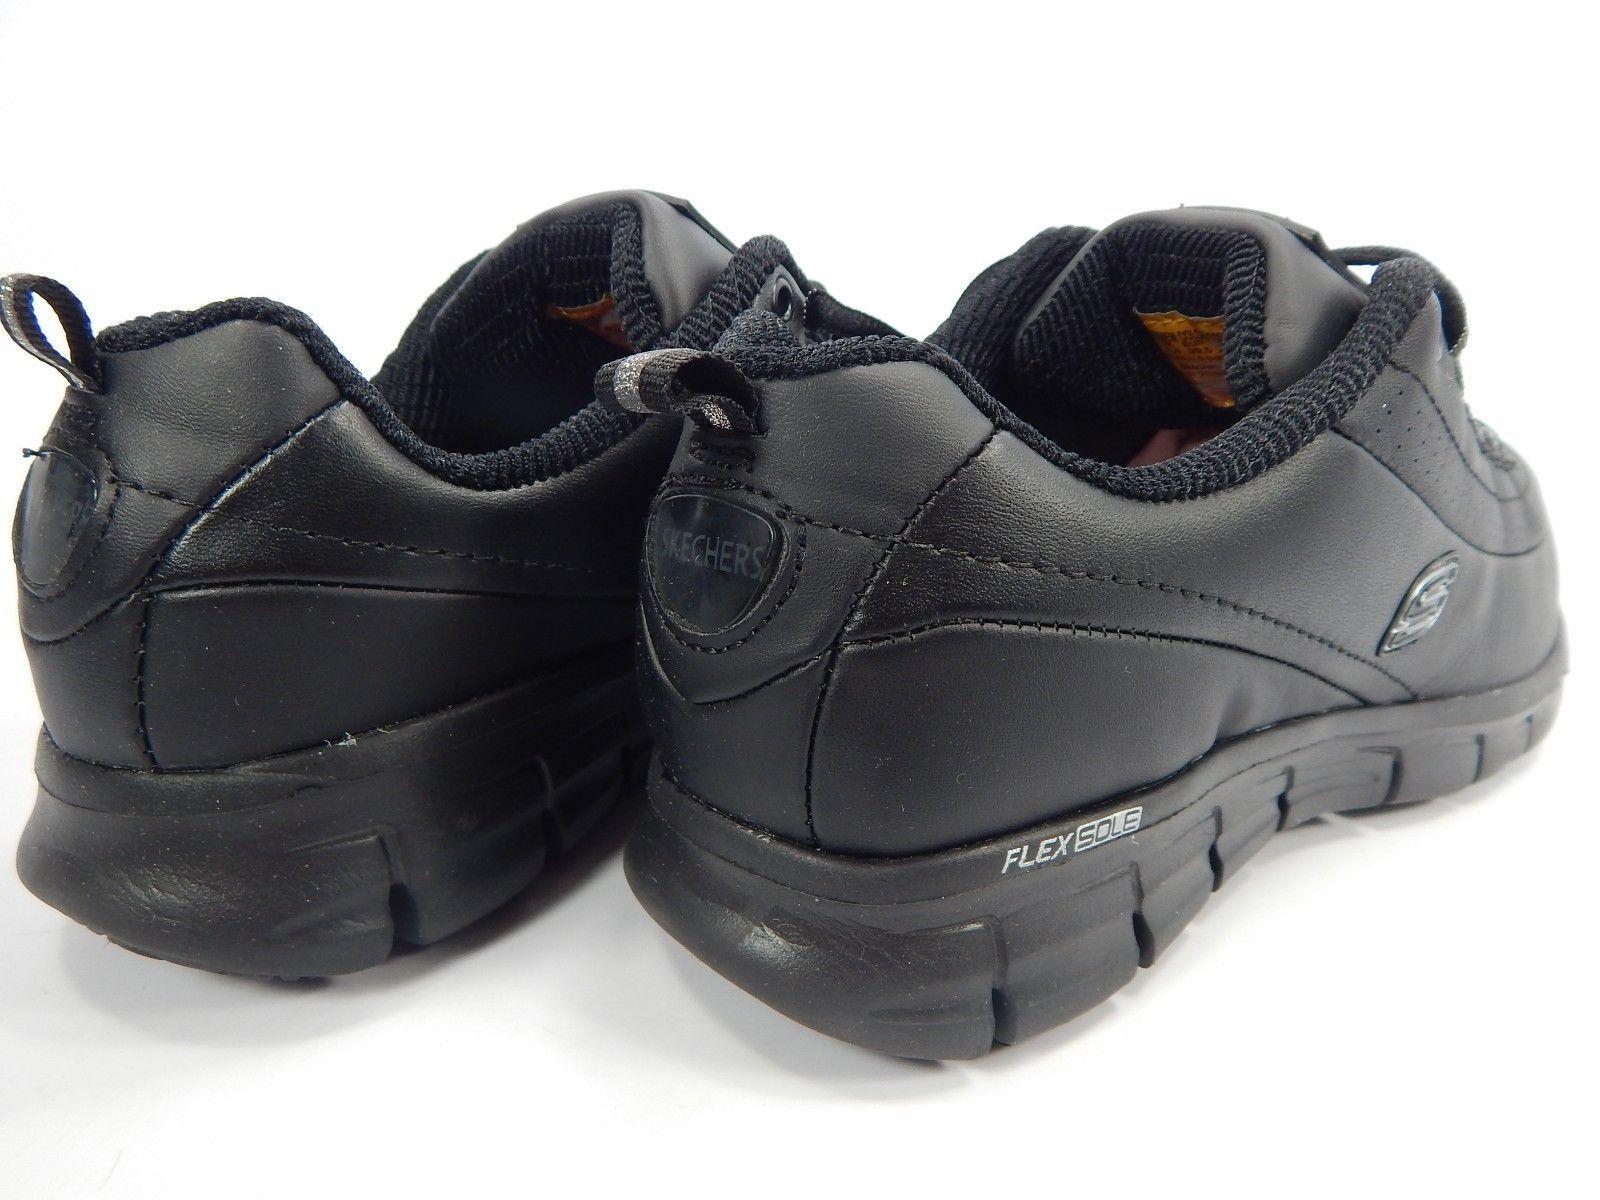 MISMATCH Skechers Work Shoes Women's Size 9 M Left & 9.5 2E EXTRA WIDE Right